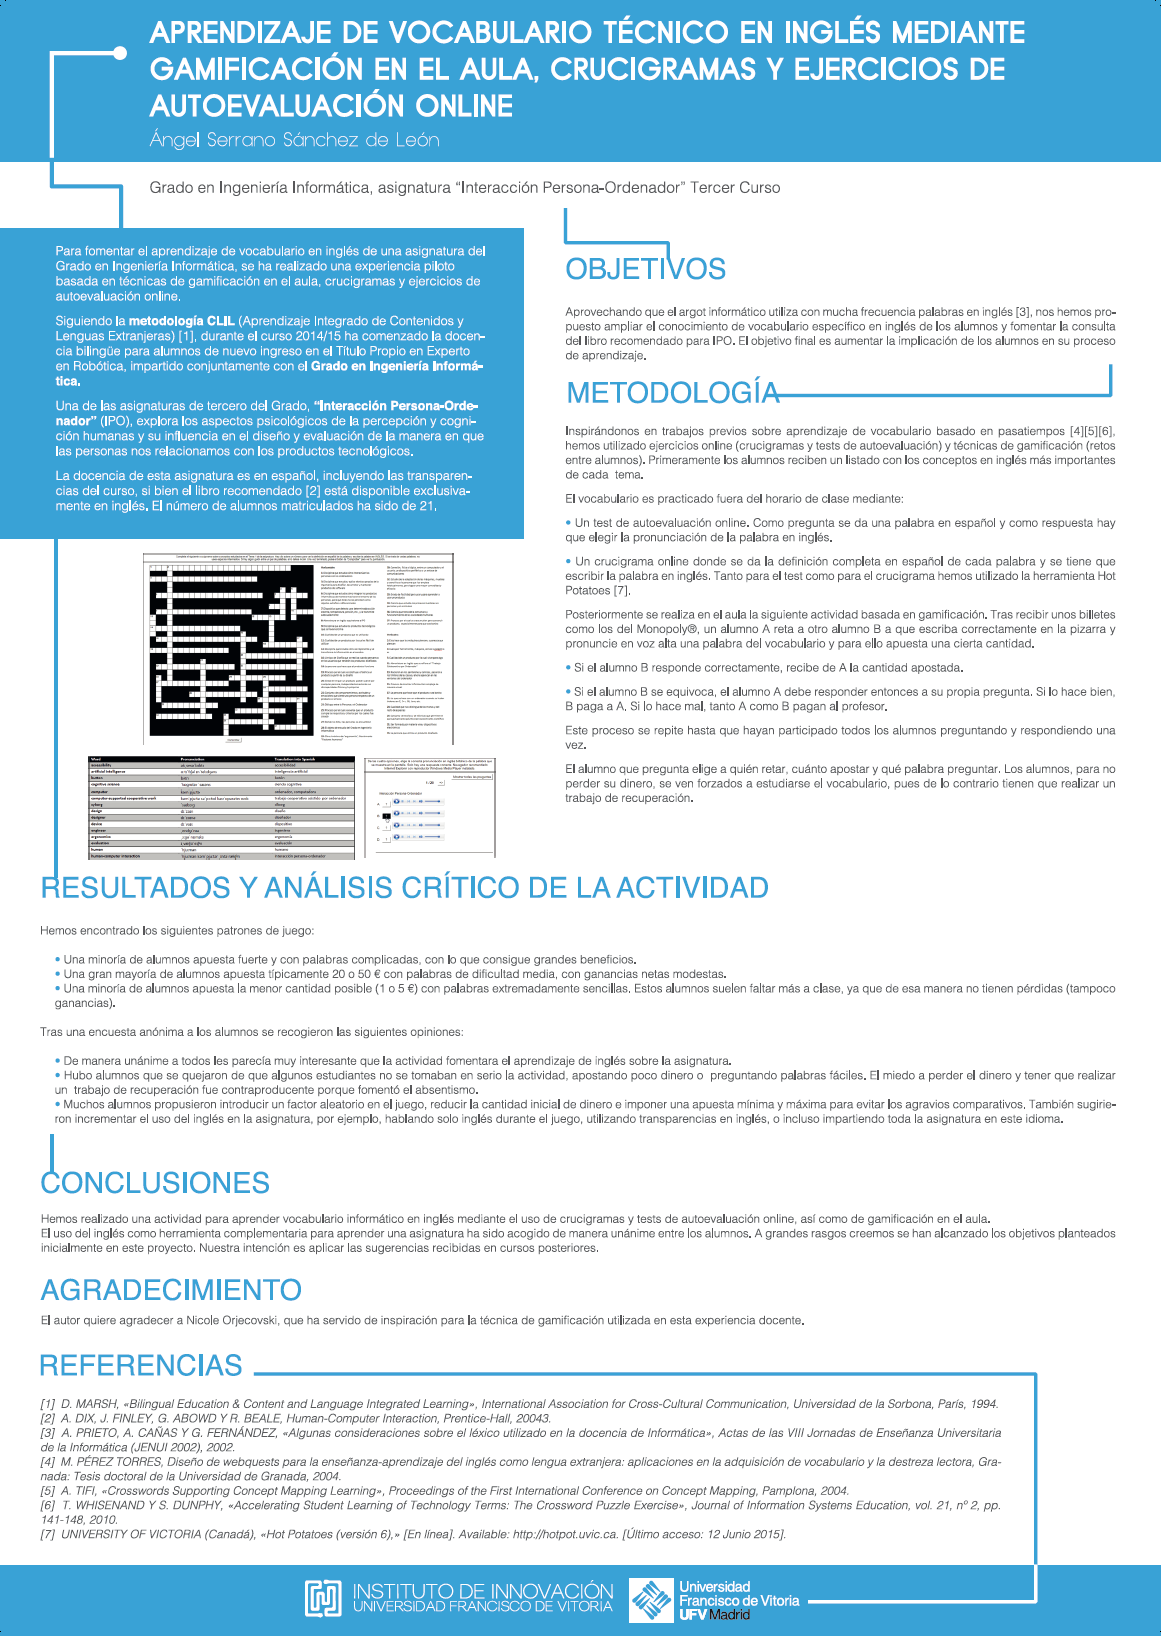 poster-innovacion-docente-2015